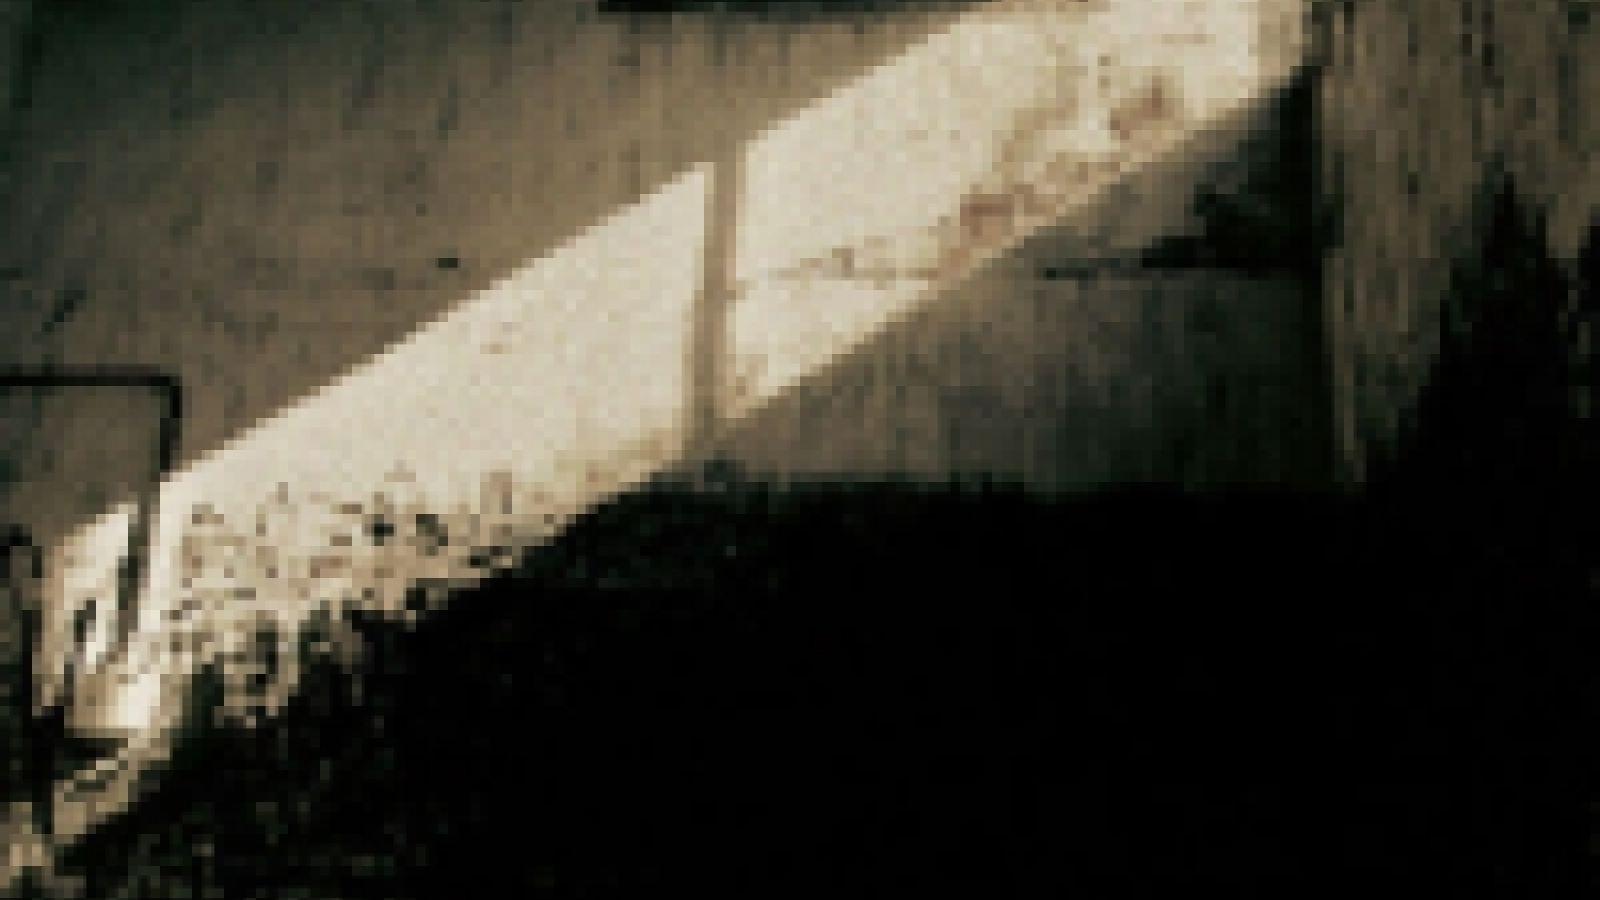 Resenha do STACKED RUBBISH, do The GazettE © JaME